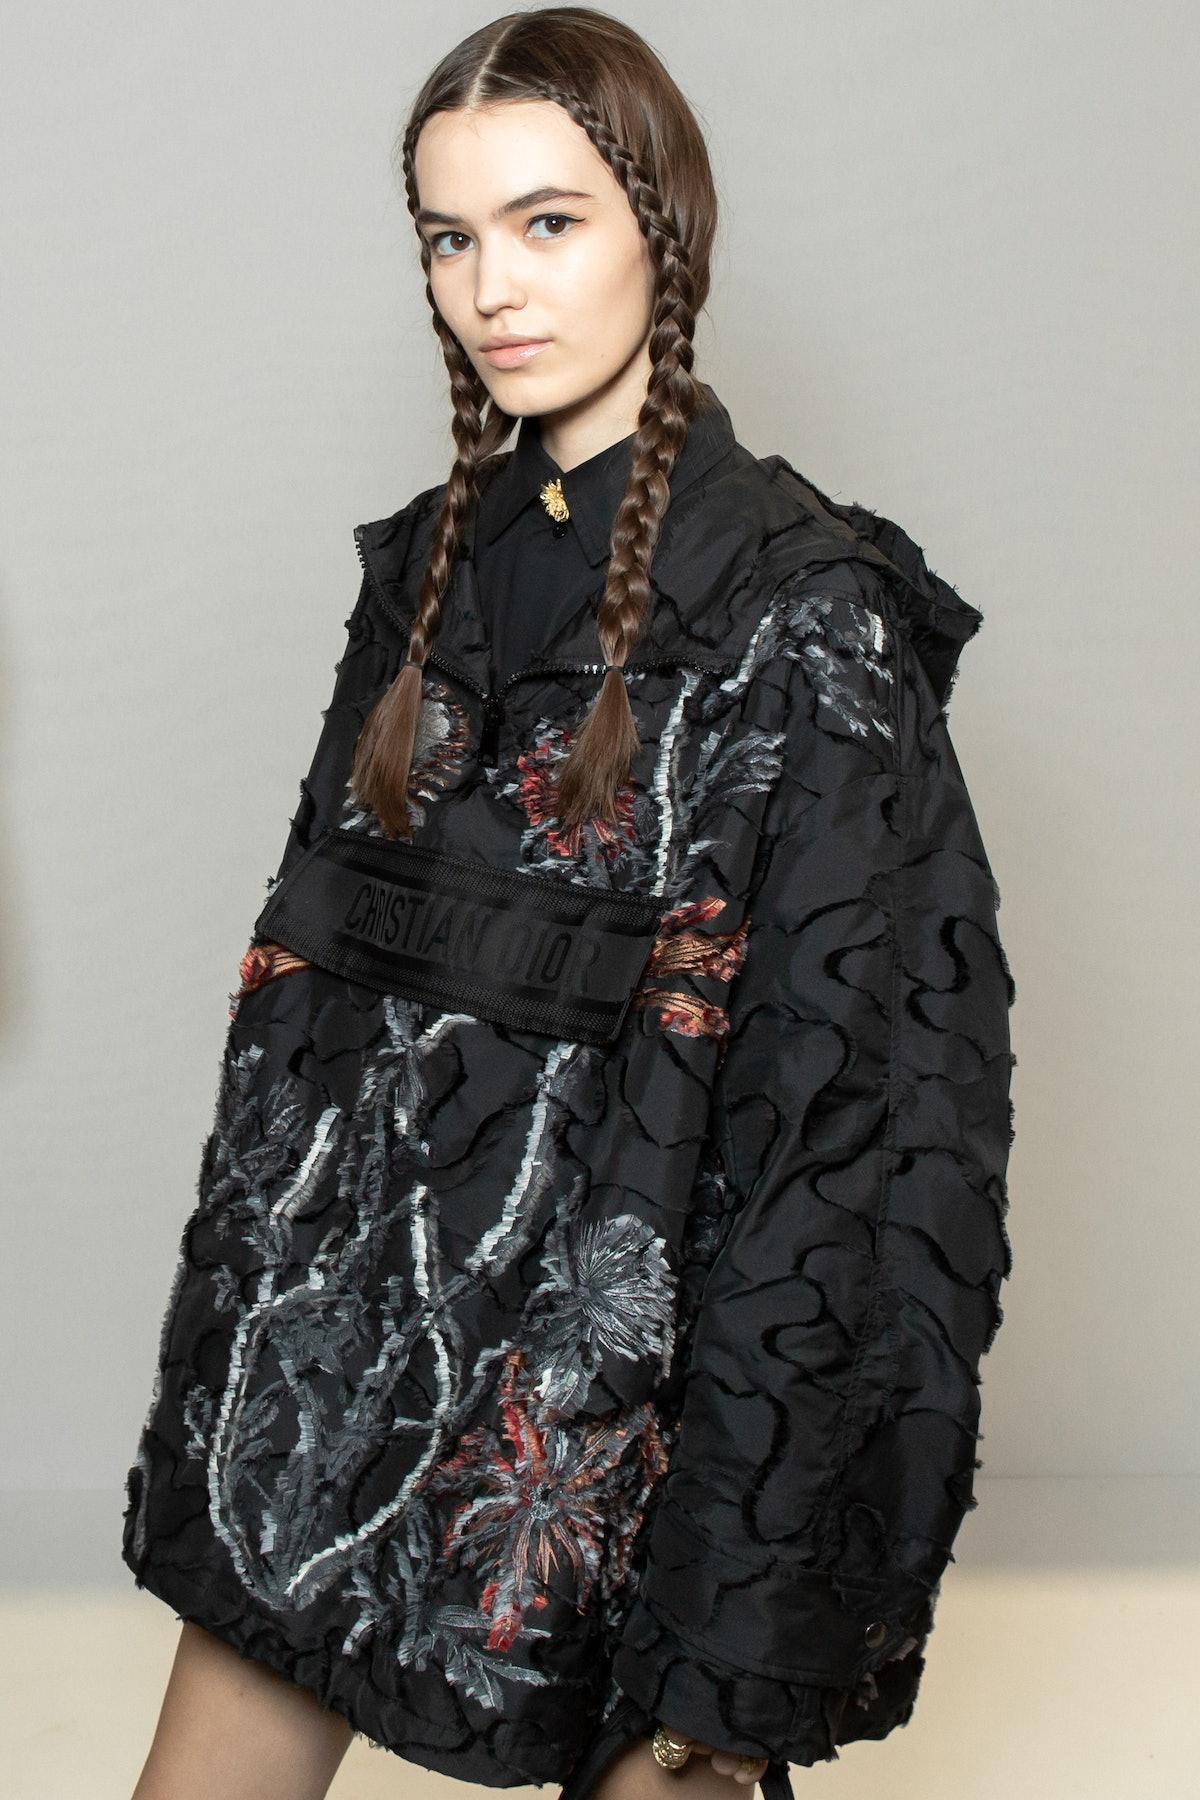 Serichai_Dior_BTS-110.jpg